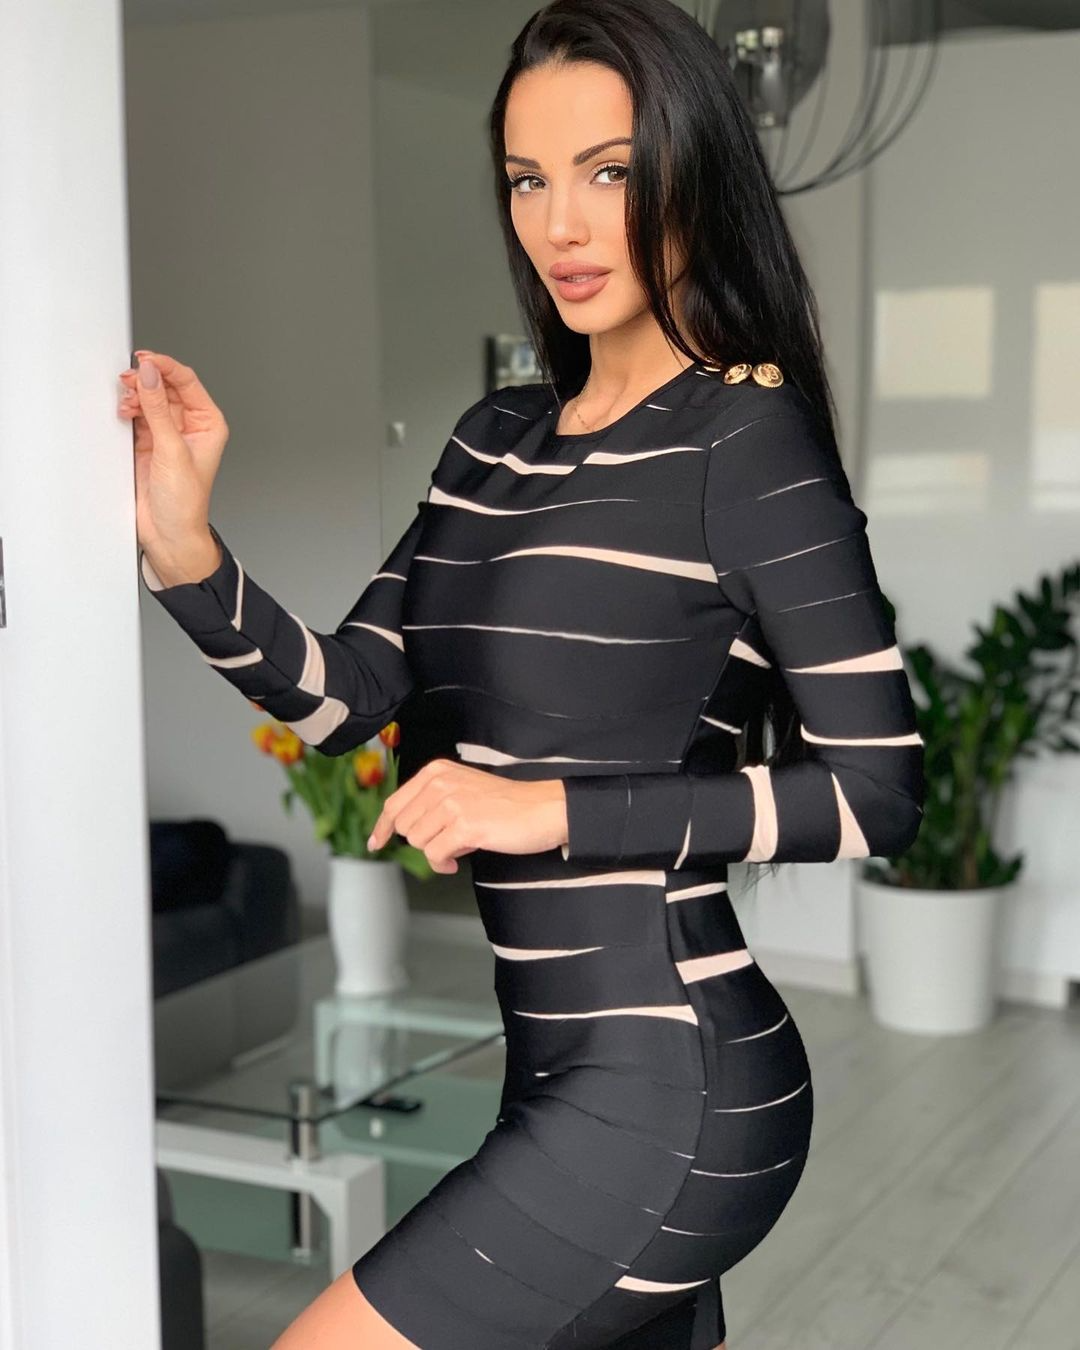 Marta-Borkowska-10